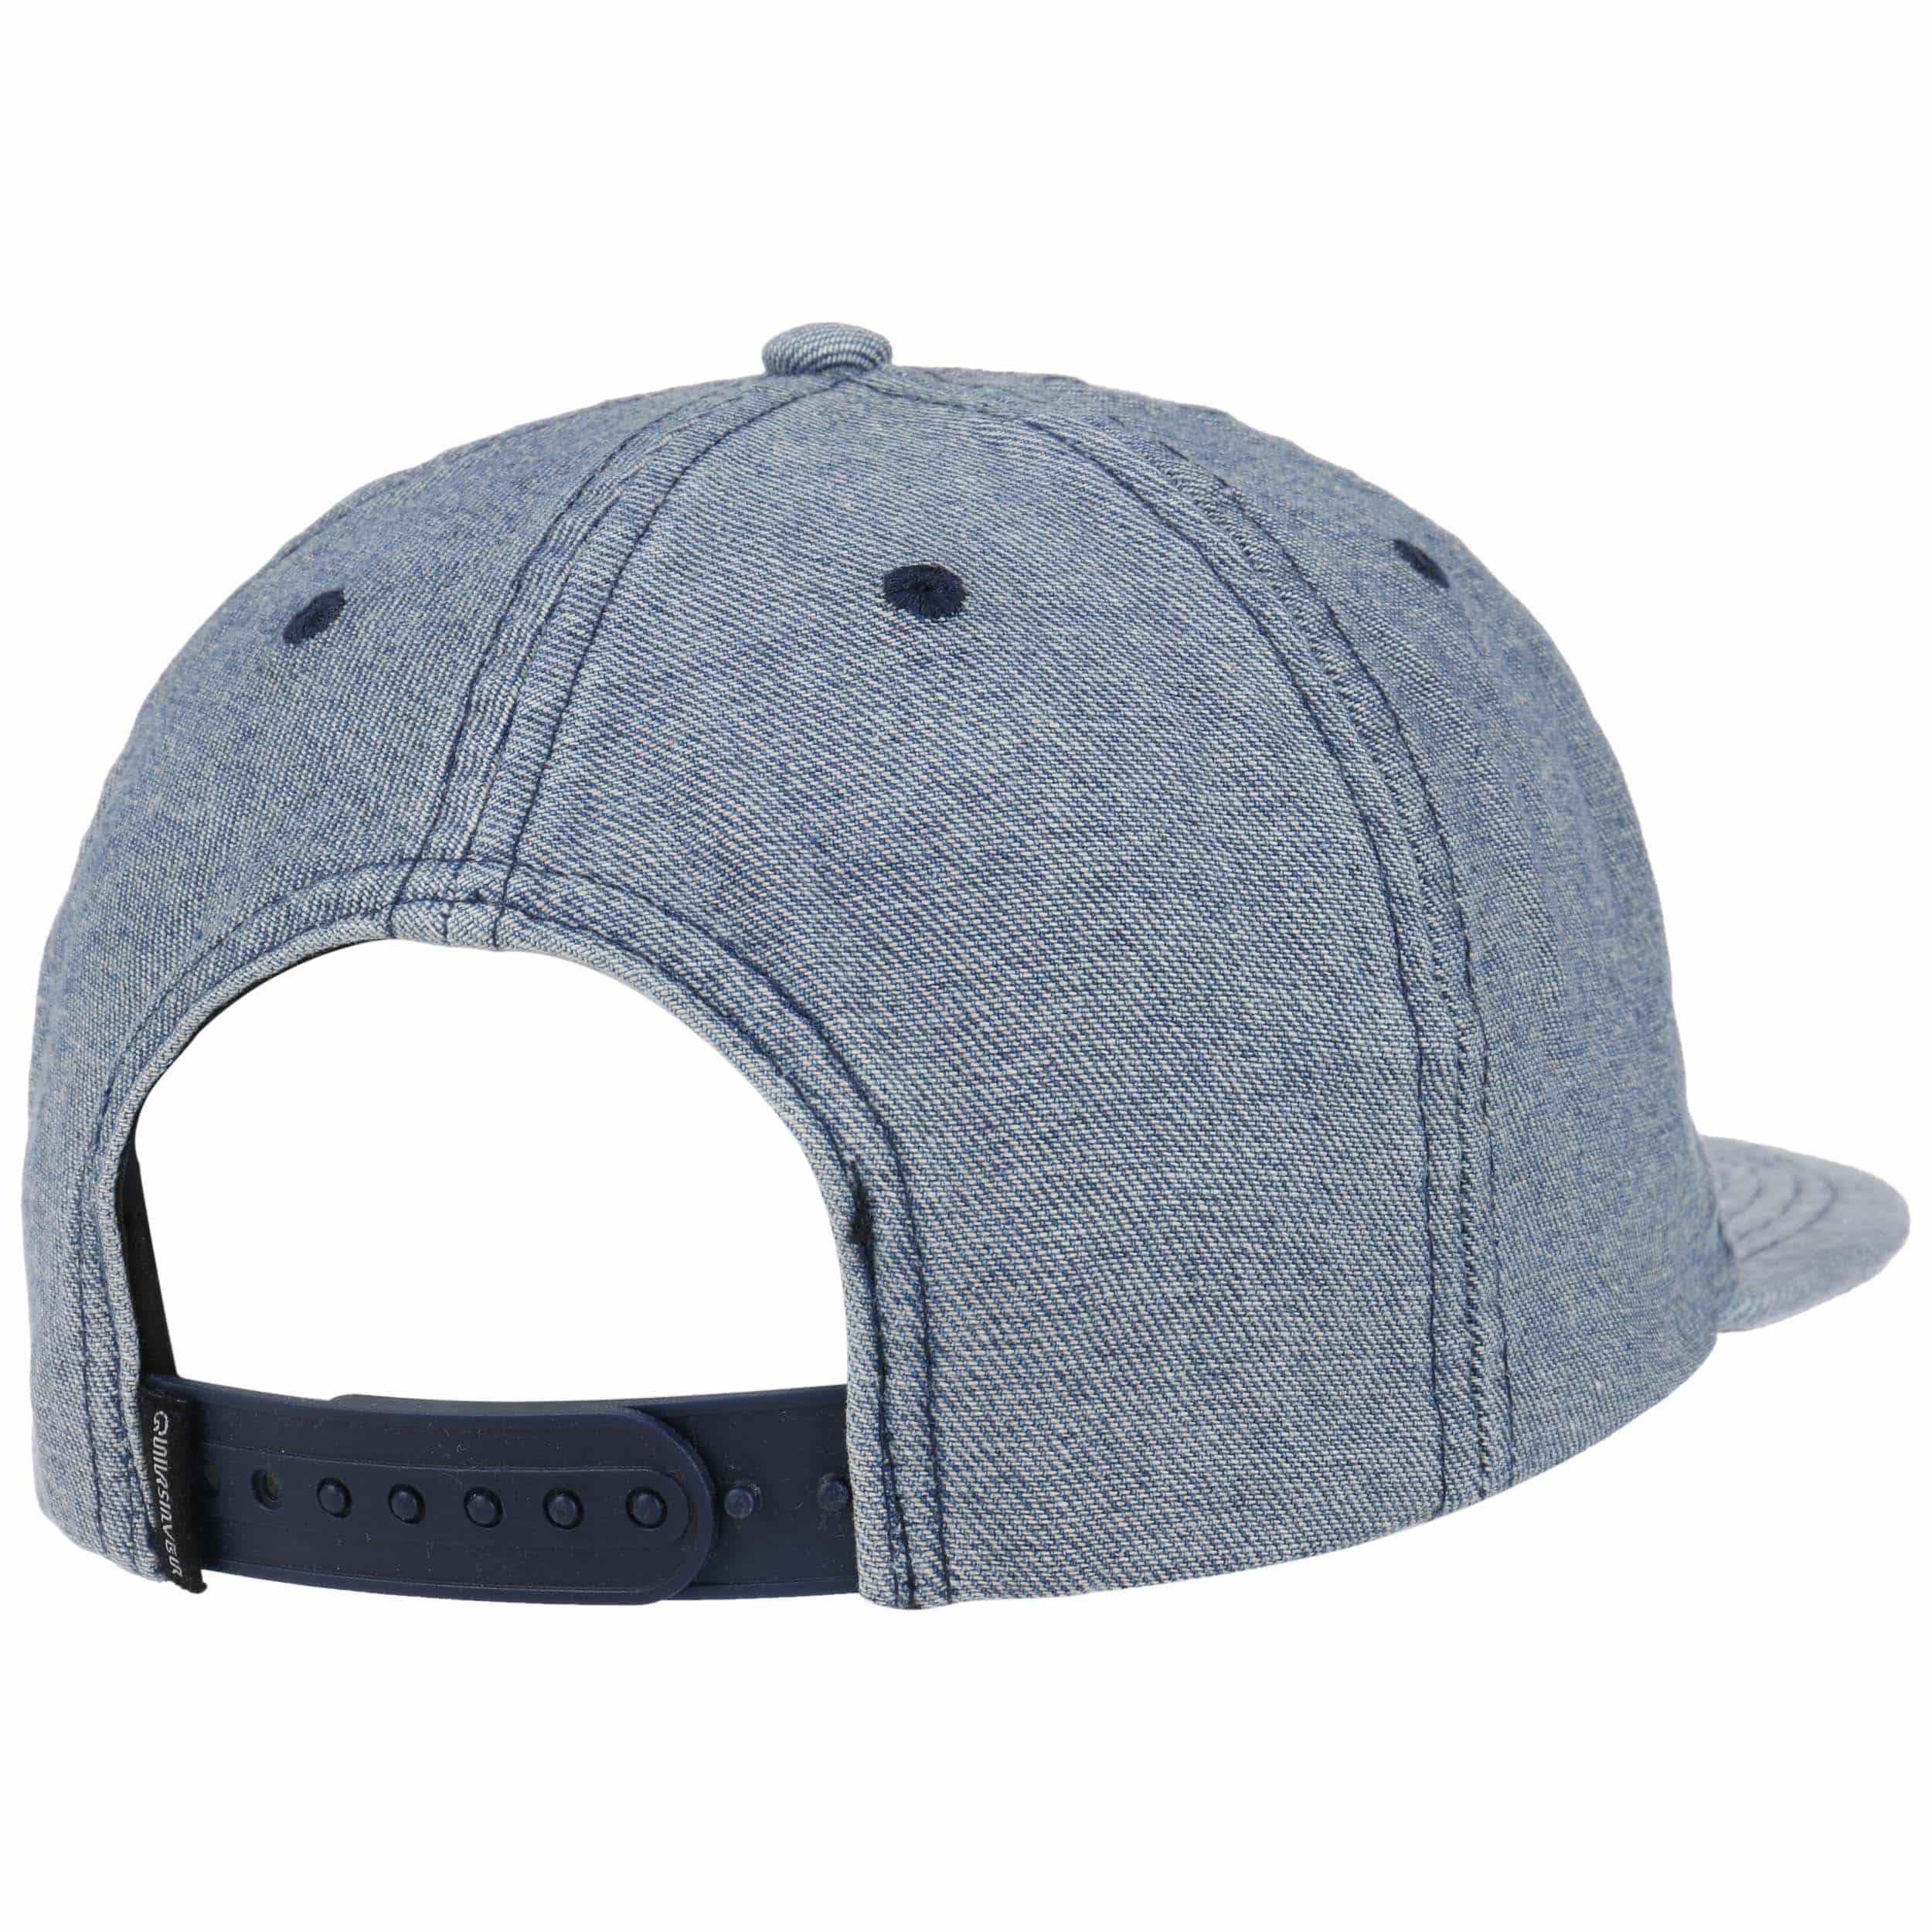 Gorra Pinchfield Snapback by Quiksilver - Gorras - sombreroshop.es 3e2c782b40f